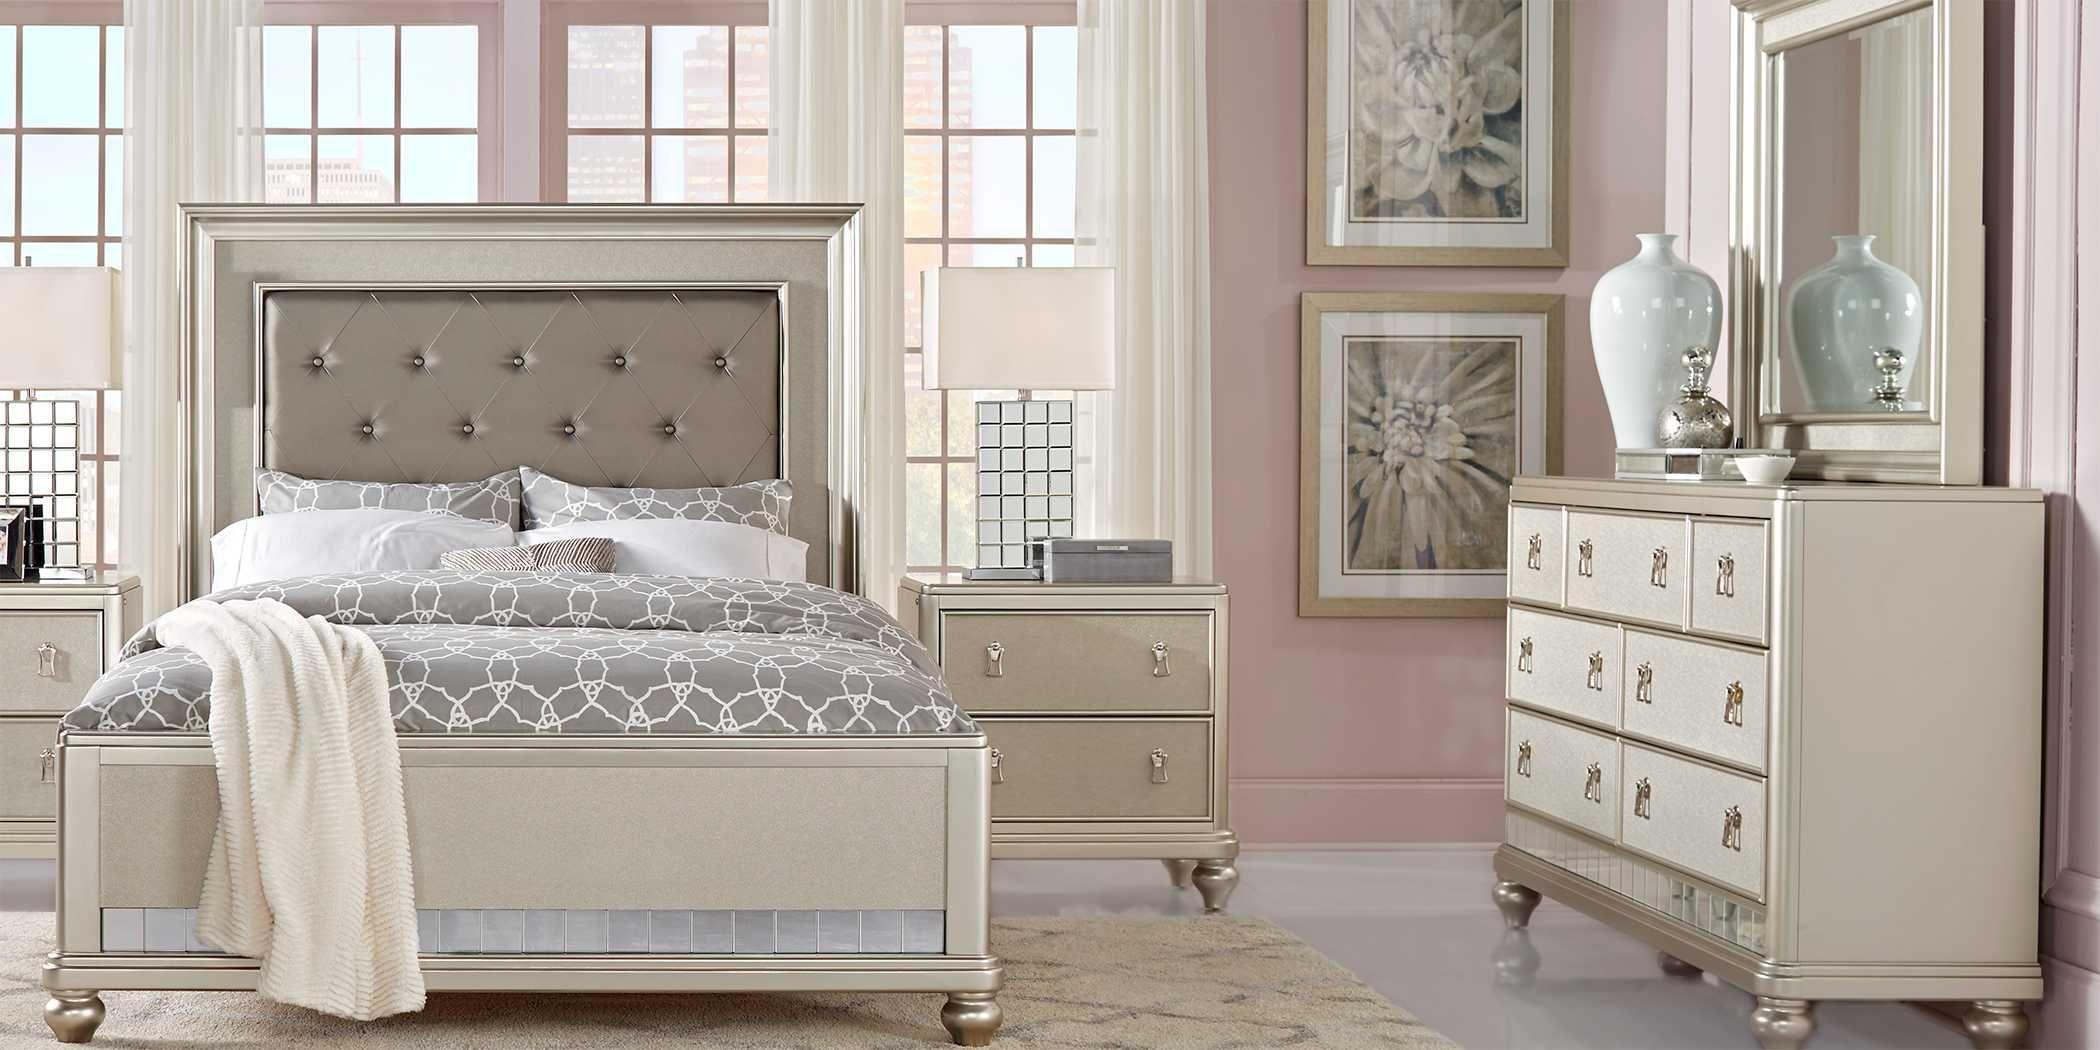 Sofia Vergara Paris Silver 7 Pc King Bedroom King Size Bedroom